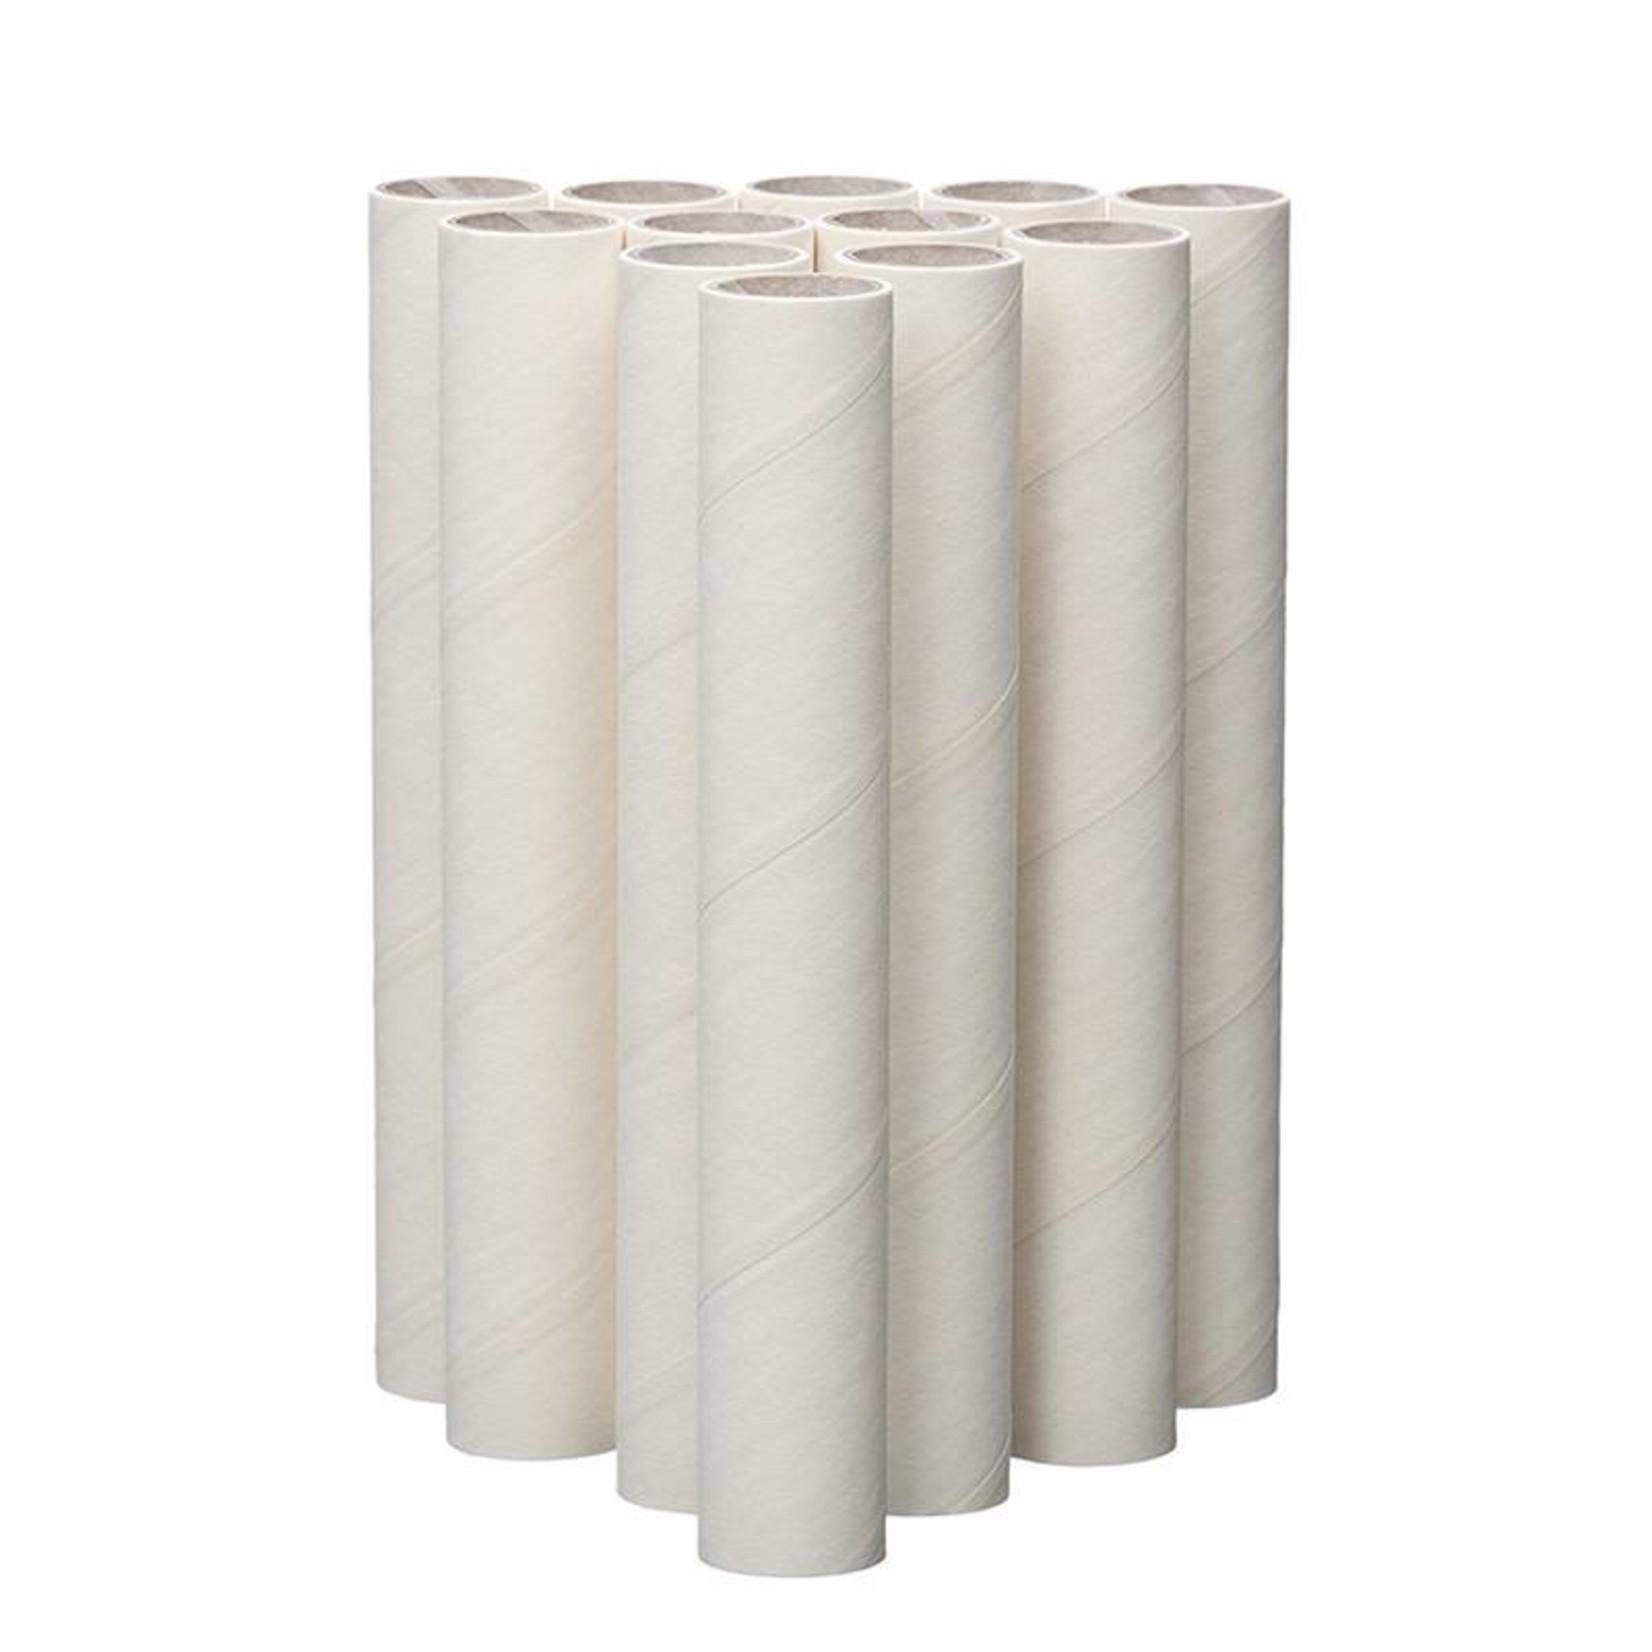 "Ateco Ateco - Dowel, 4"" Paperboard (12ct)"